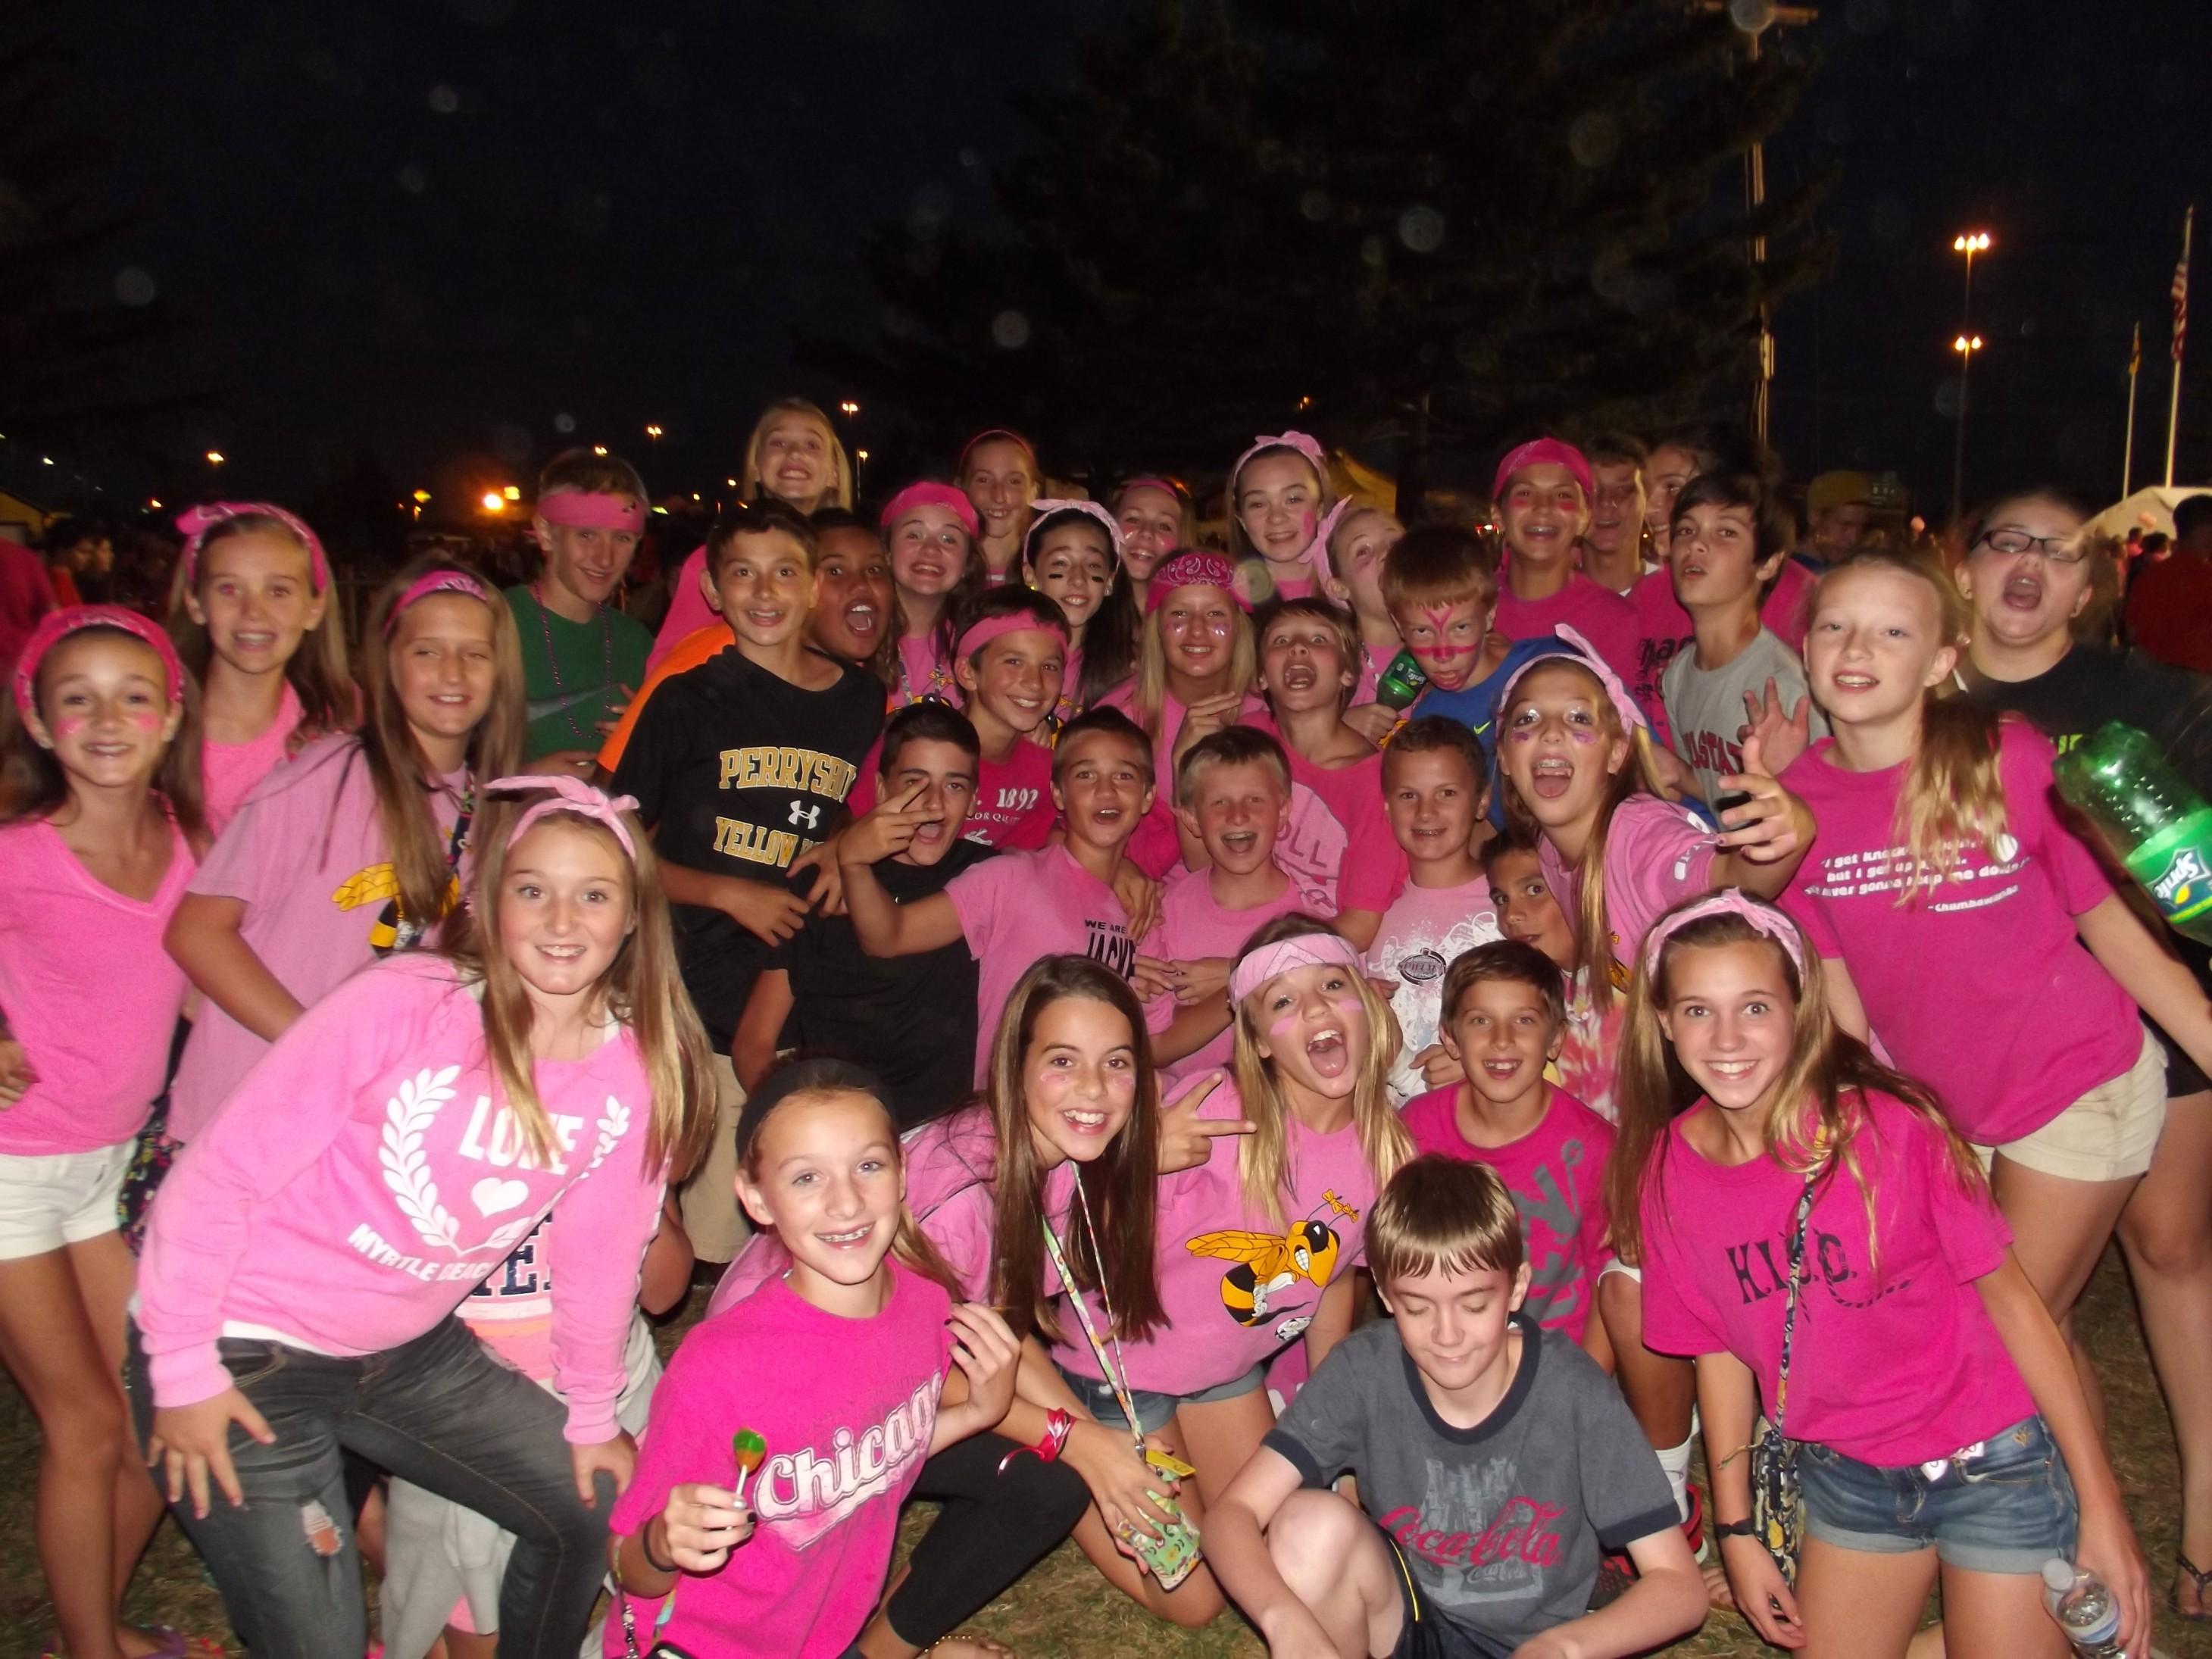 Jacket fans Go Pink for breast cancer awarness